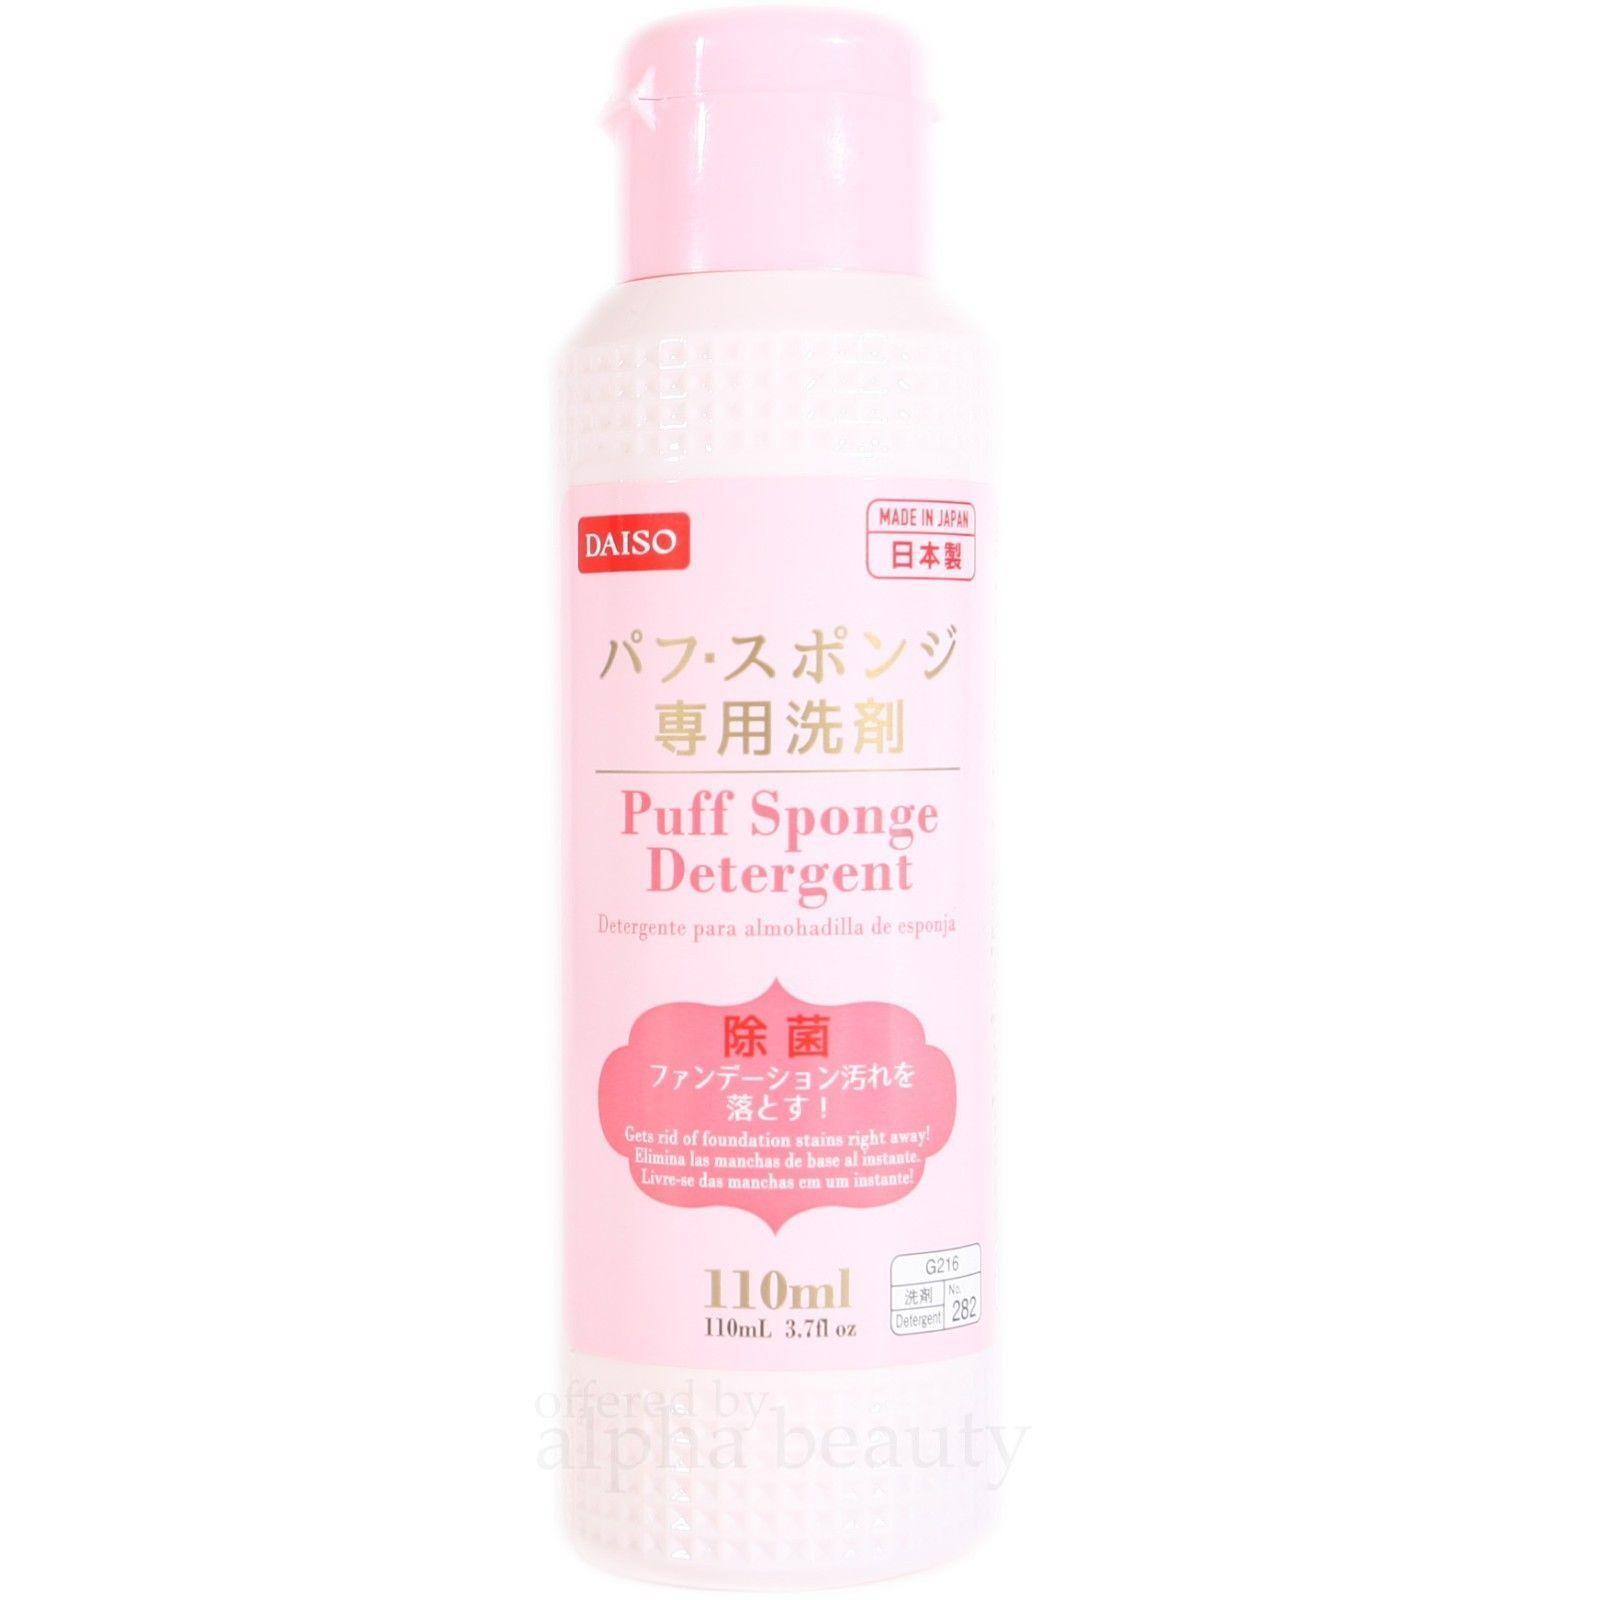 Daiso Makeup Puffs Sponges Wedges Health Beauty Lotion Makeup Daiso Japan